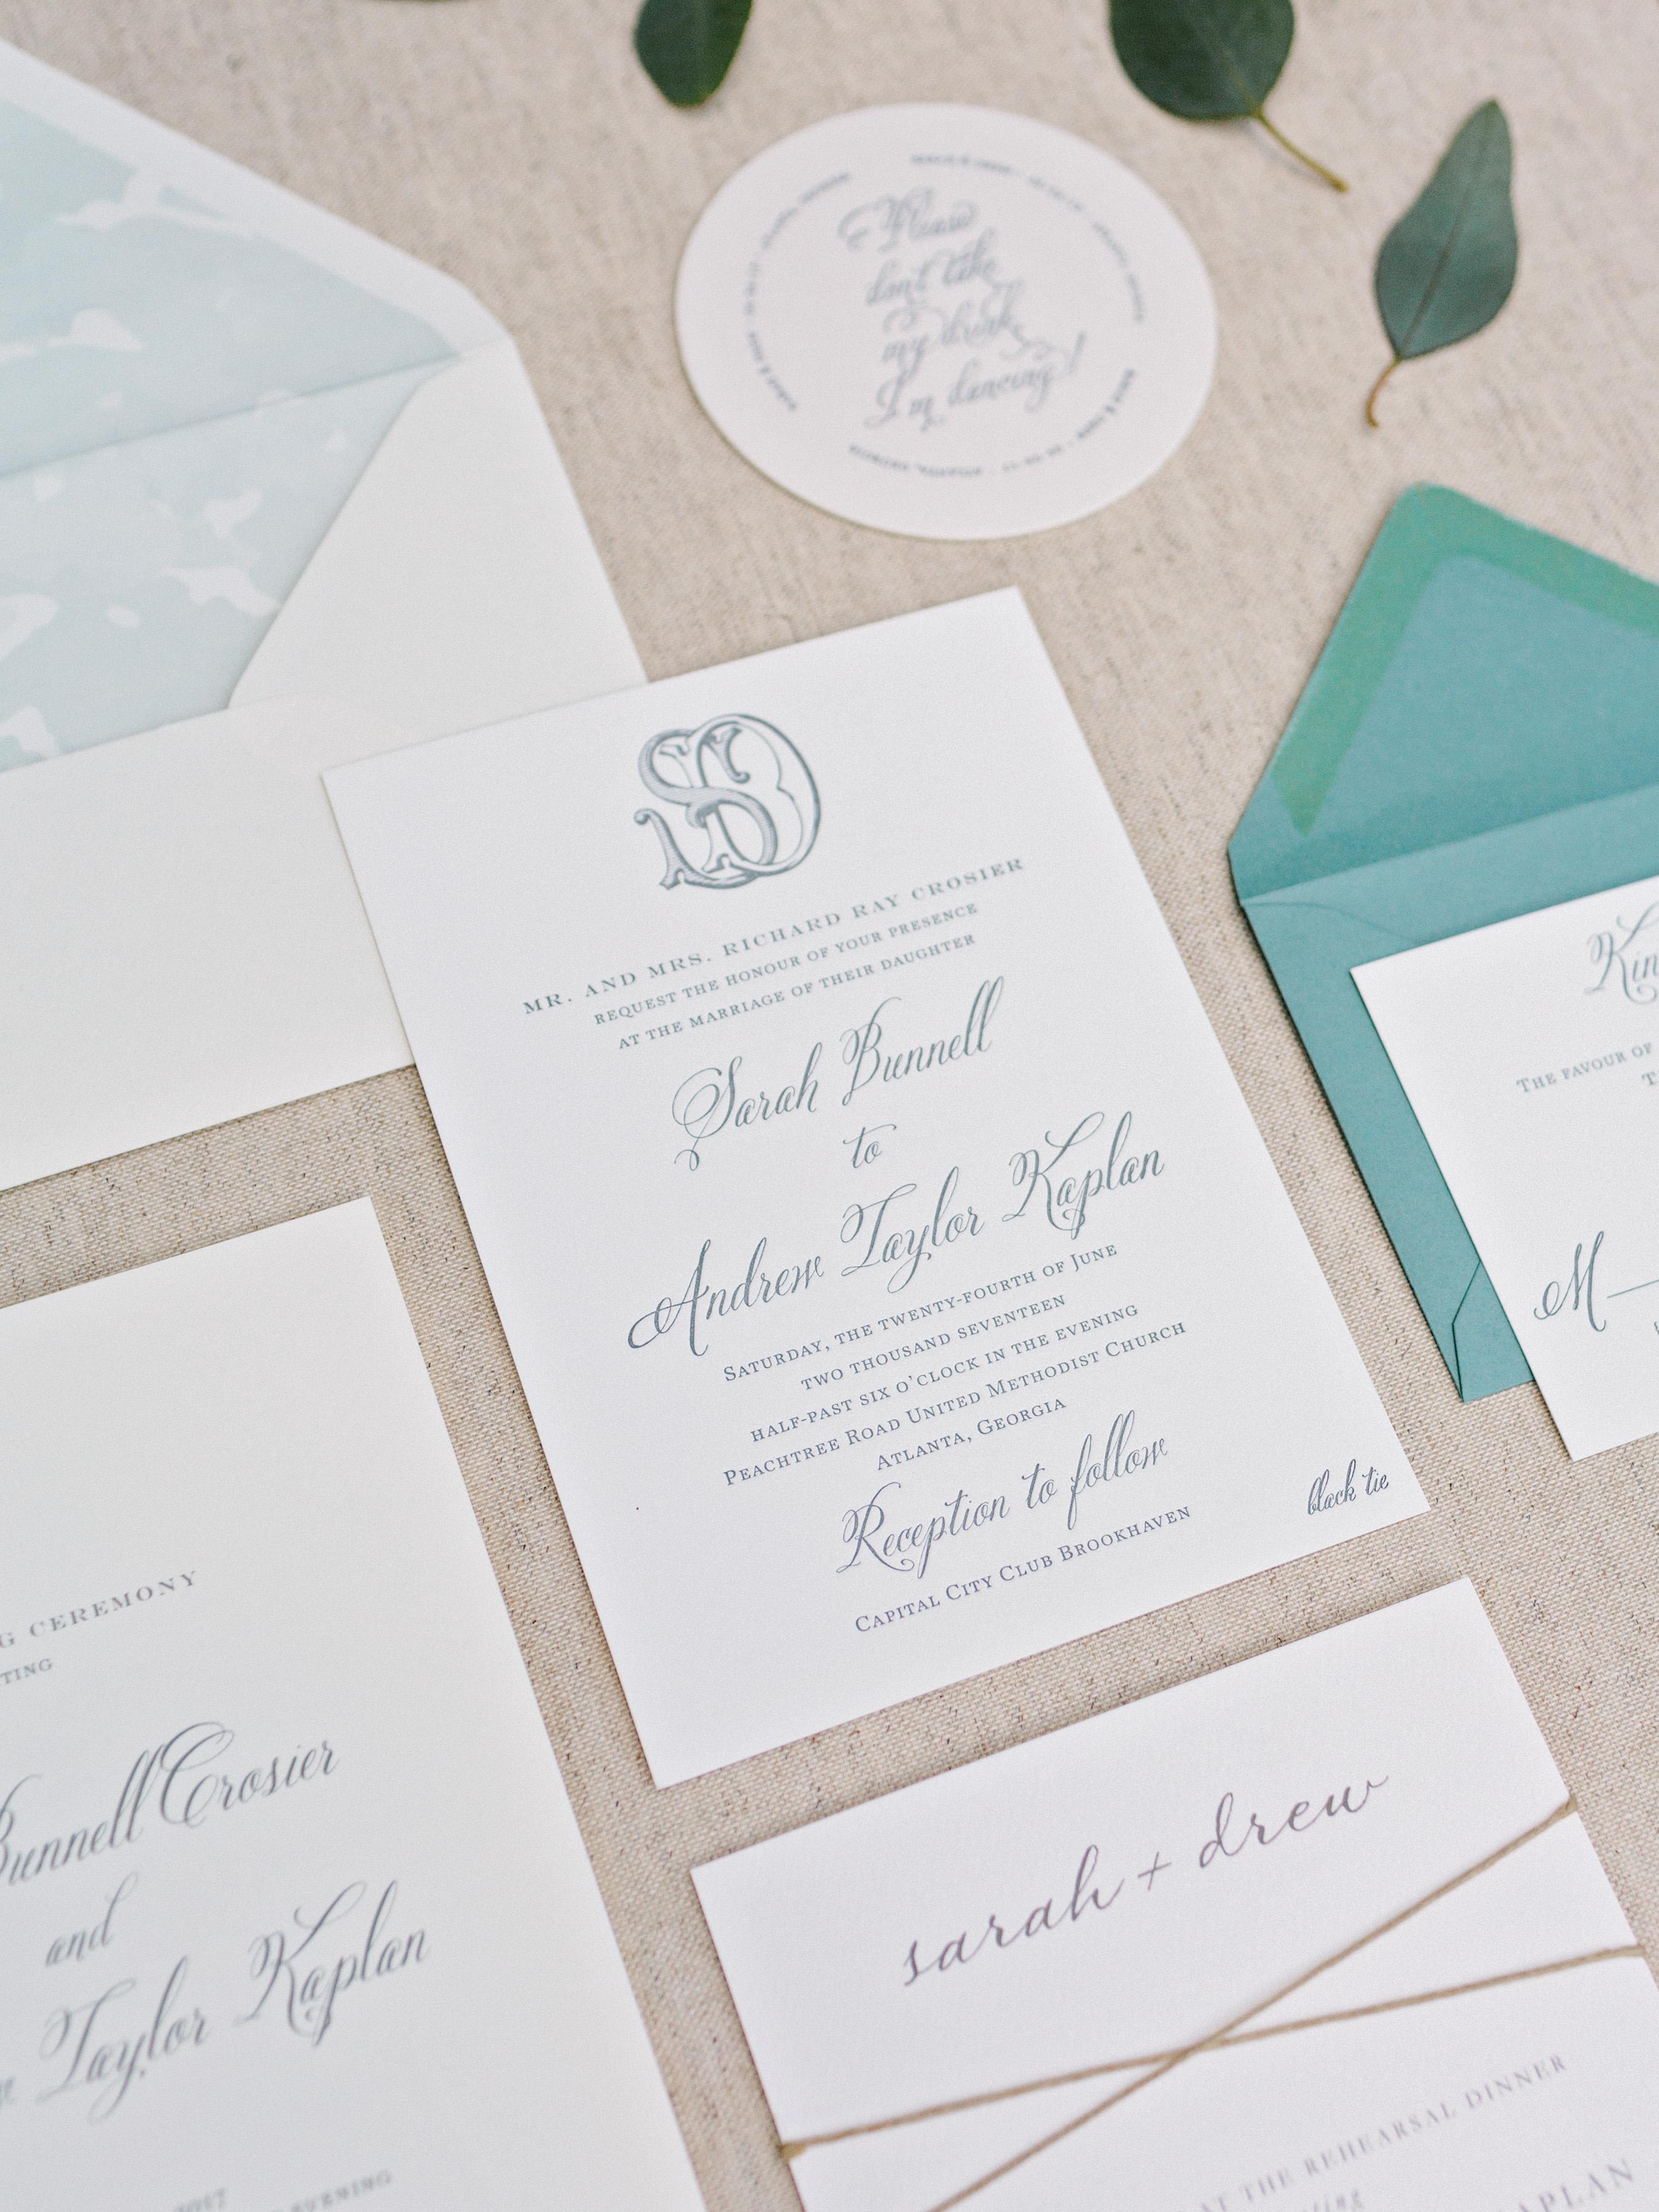 blue-and-white wedding invitation